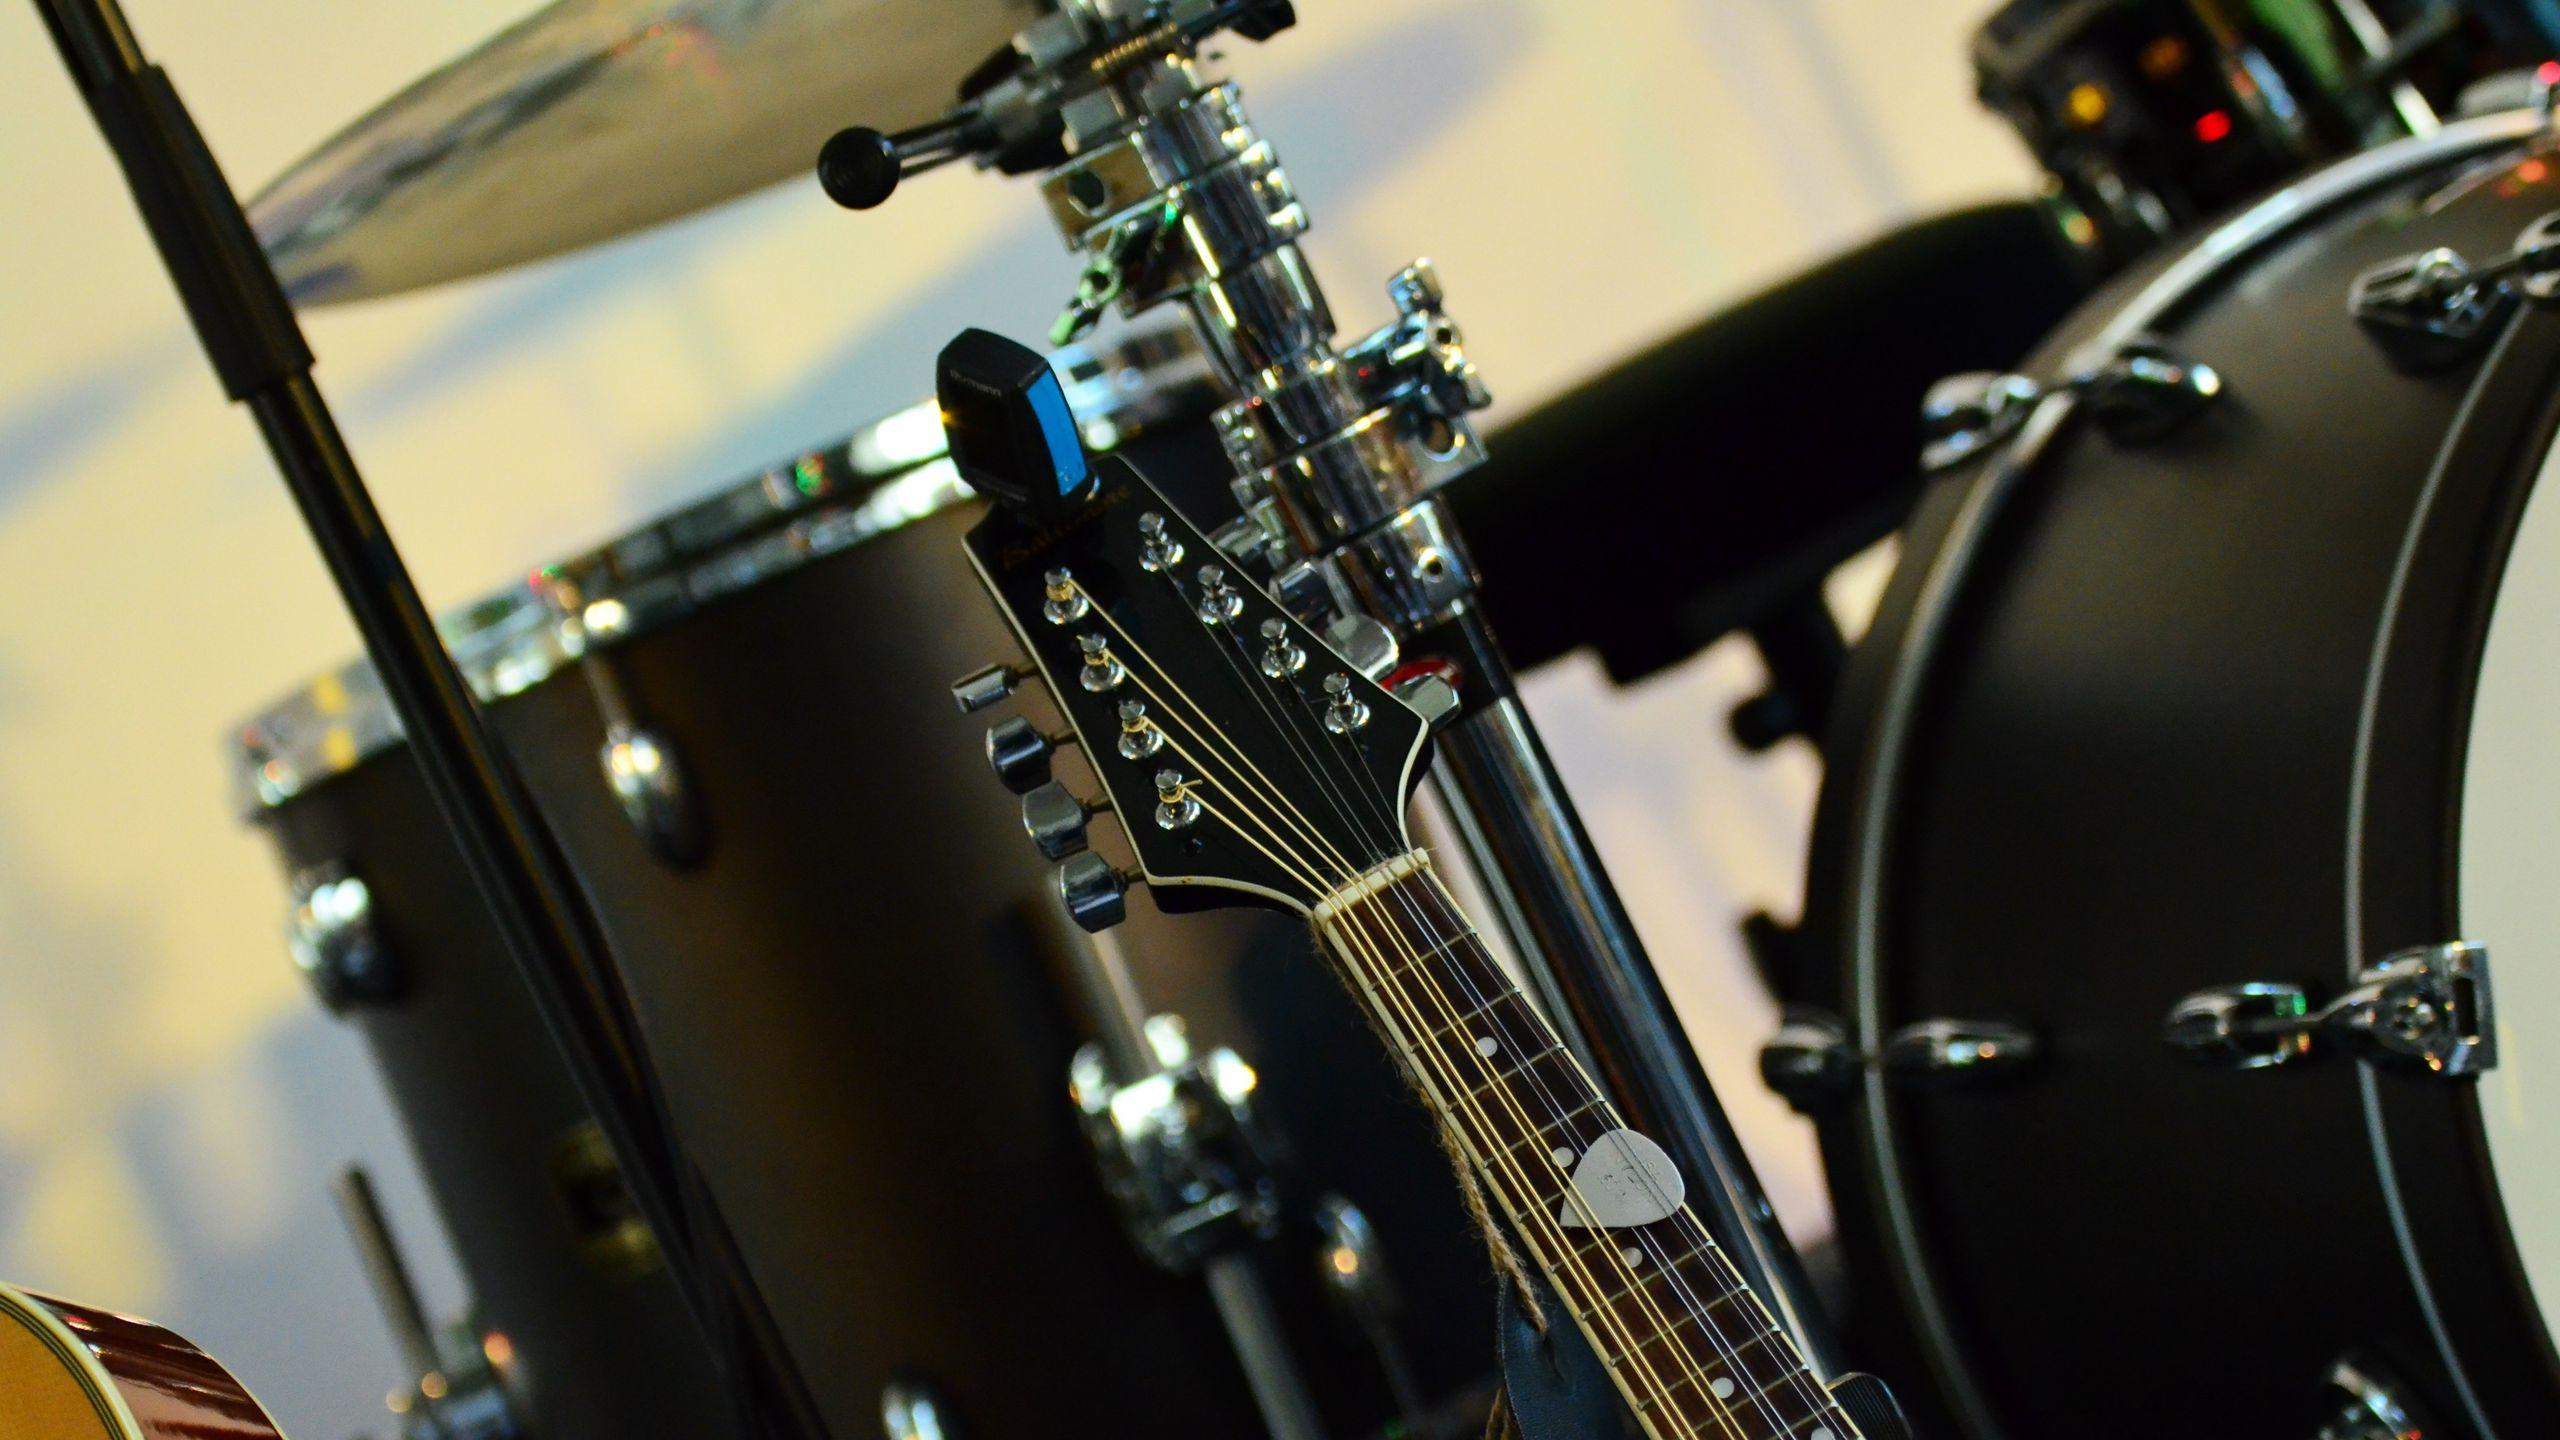 2560x1440 Wallpaper musical instrument, music, percussion, guitar